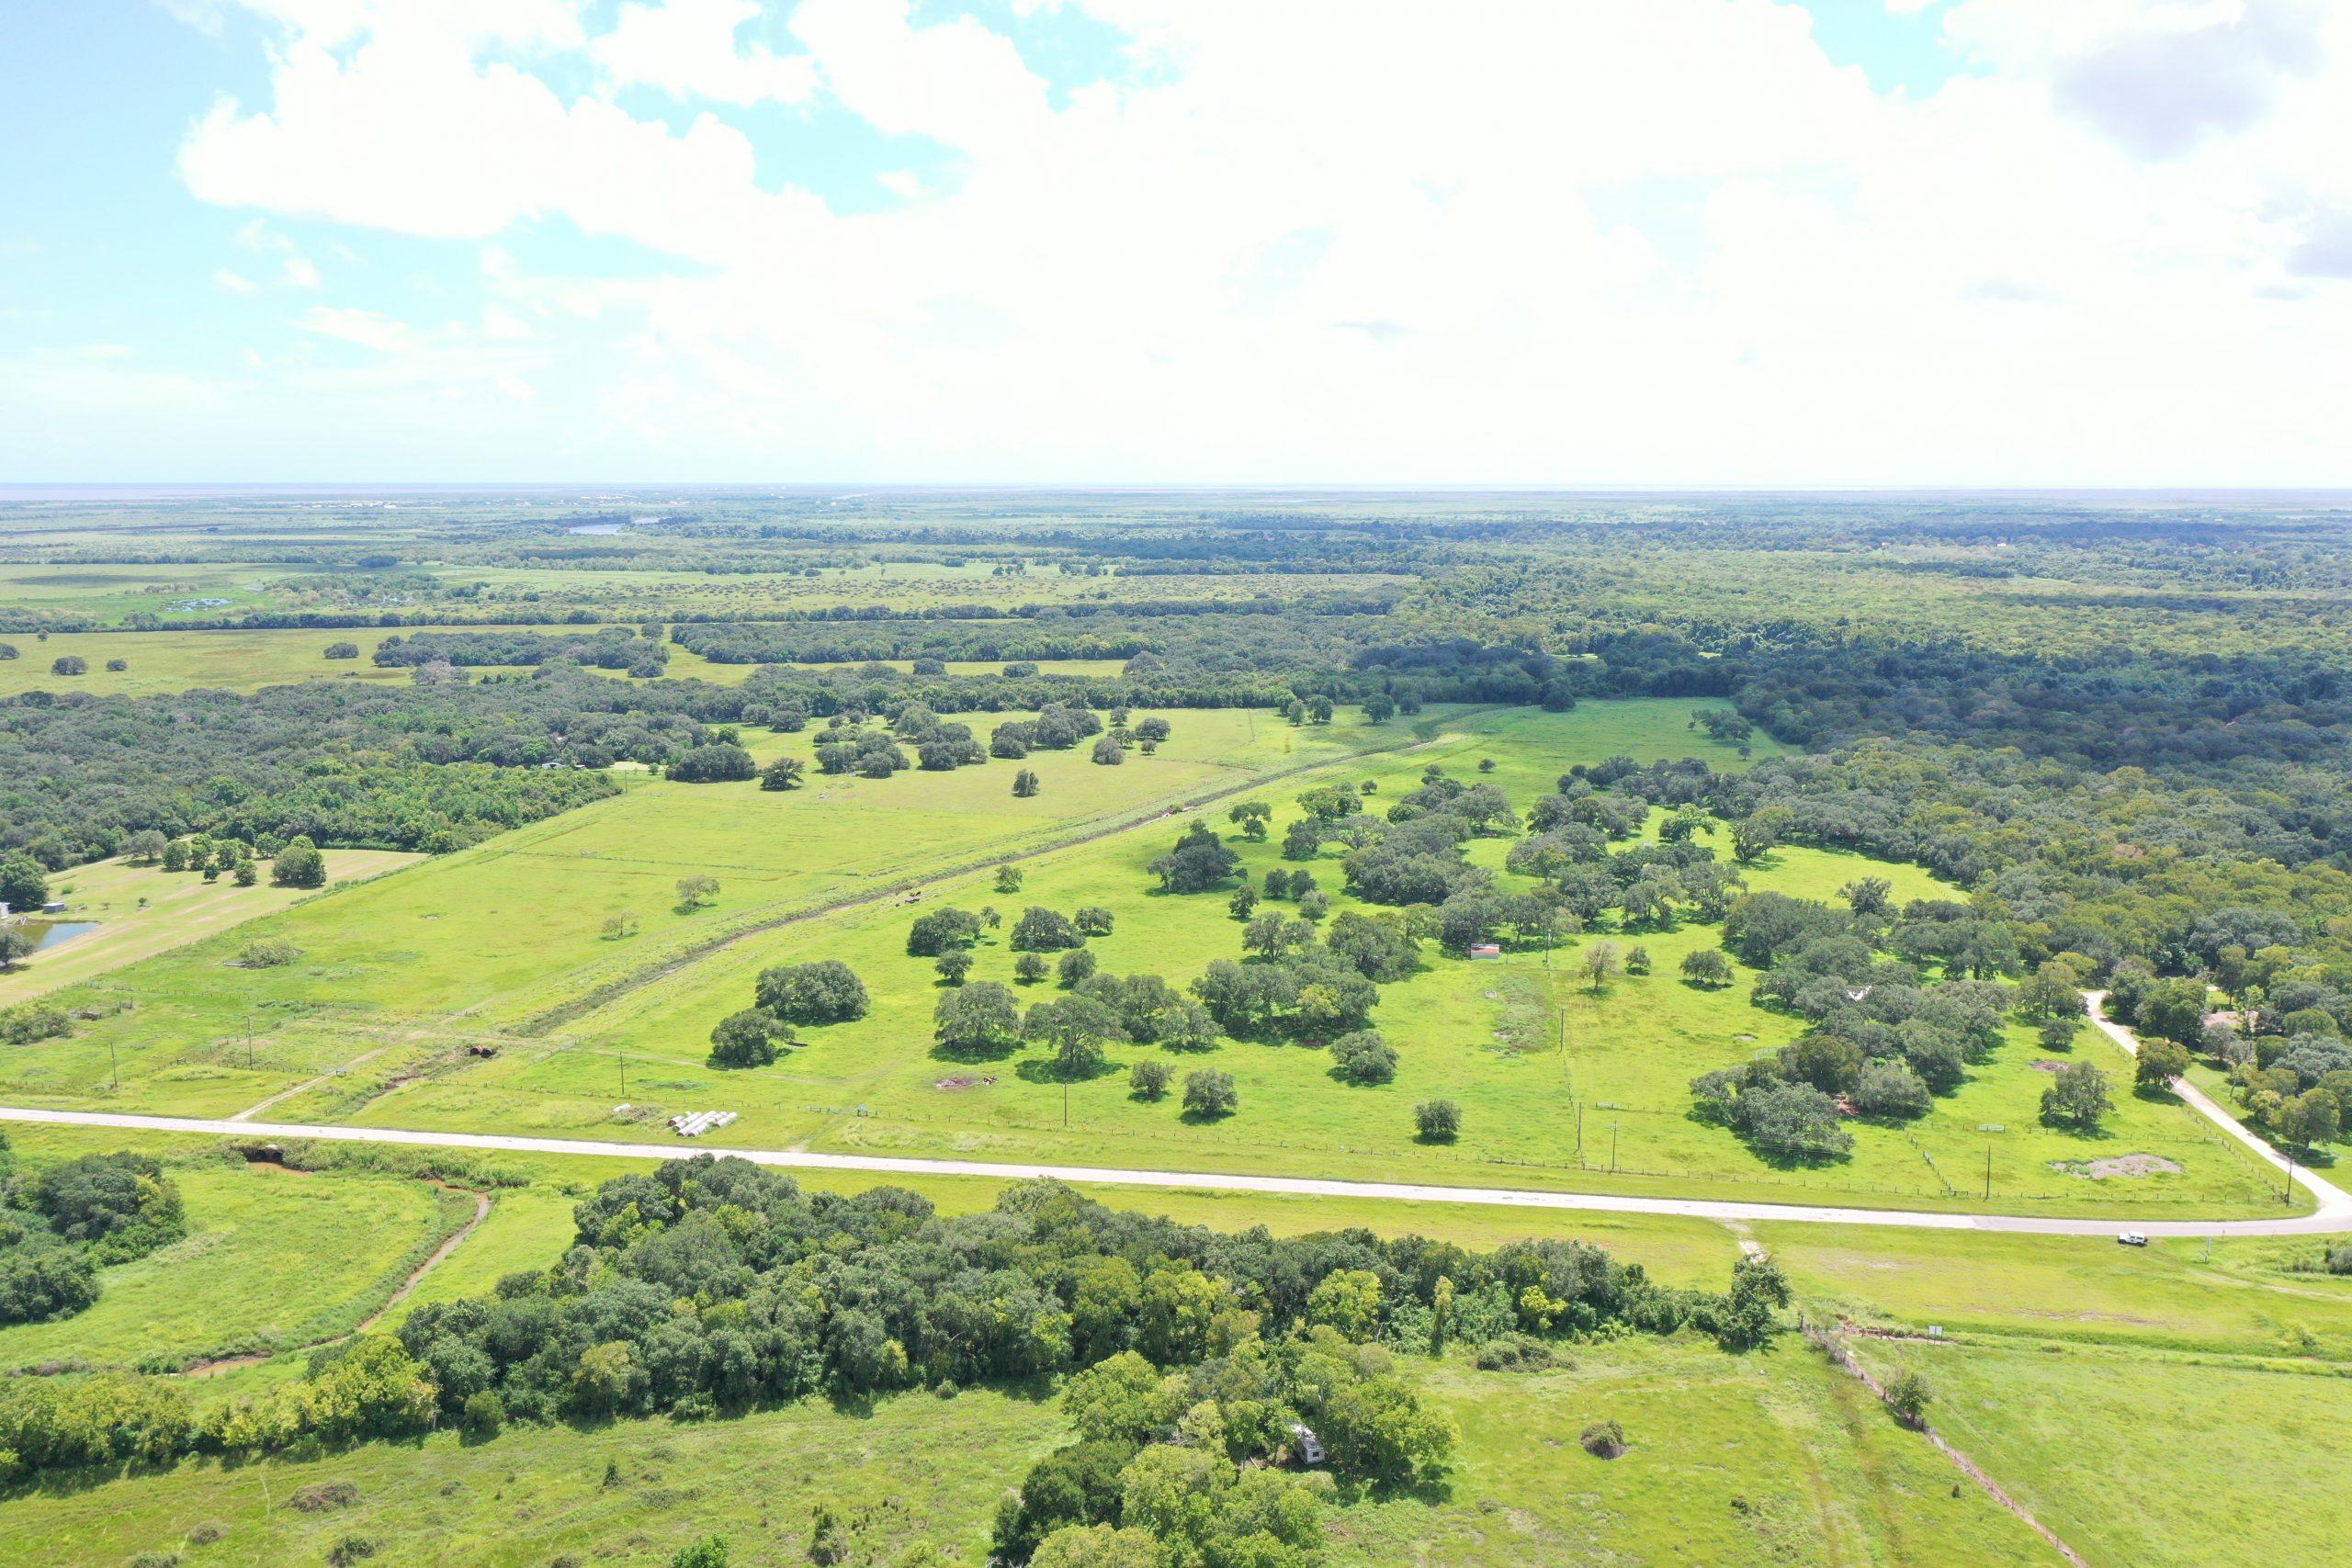 70 Acres Ranch in Matagorda County